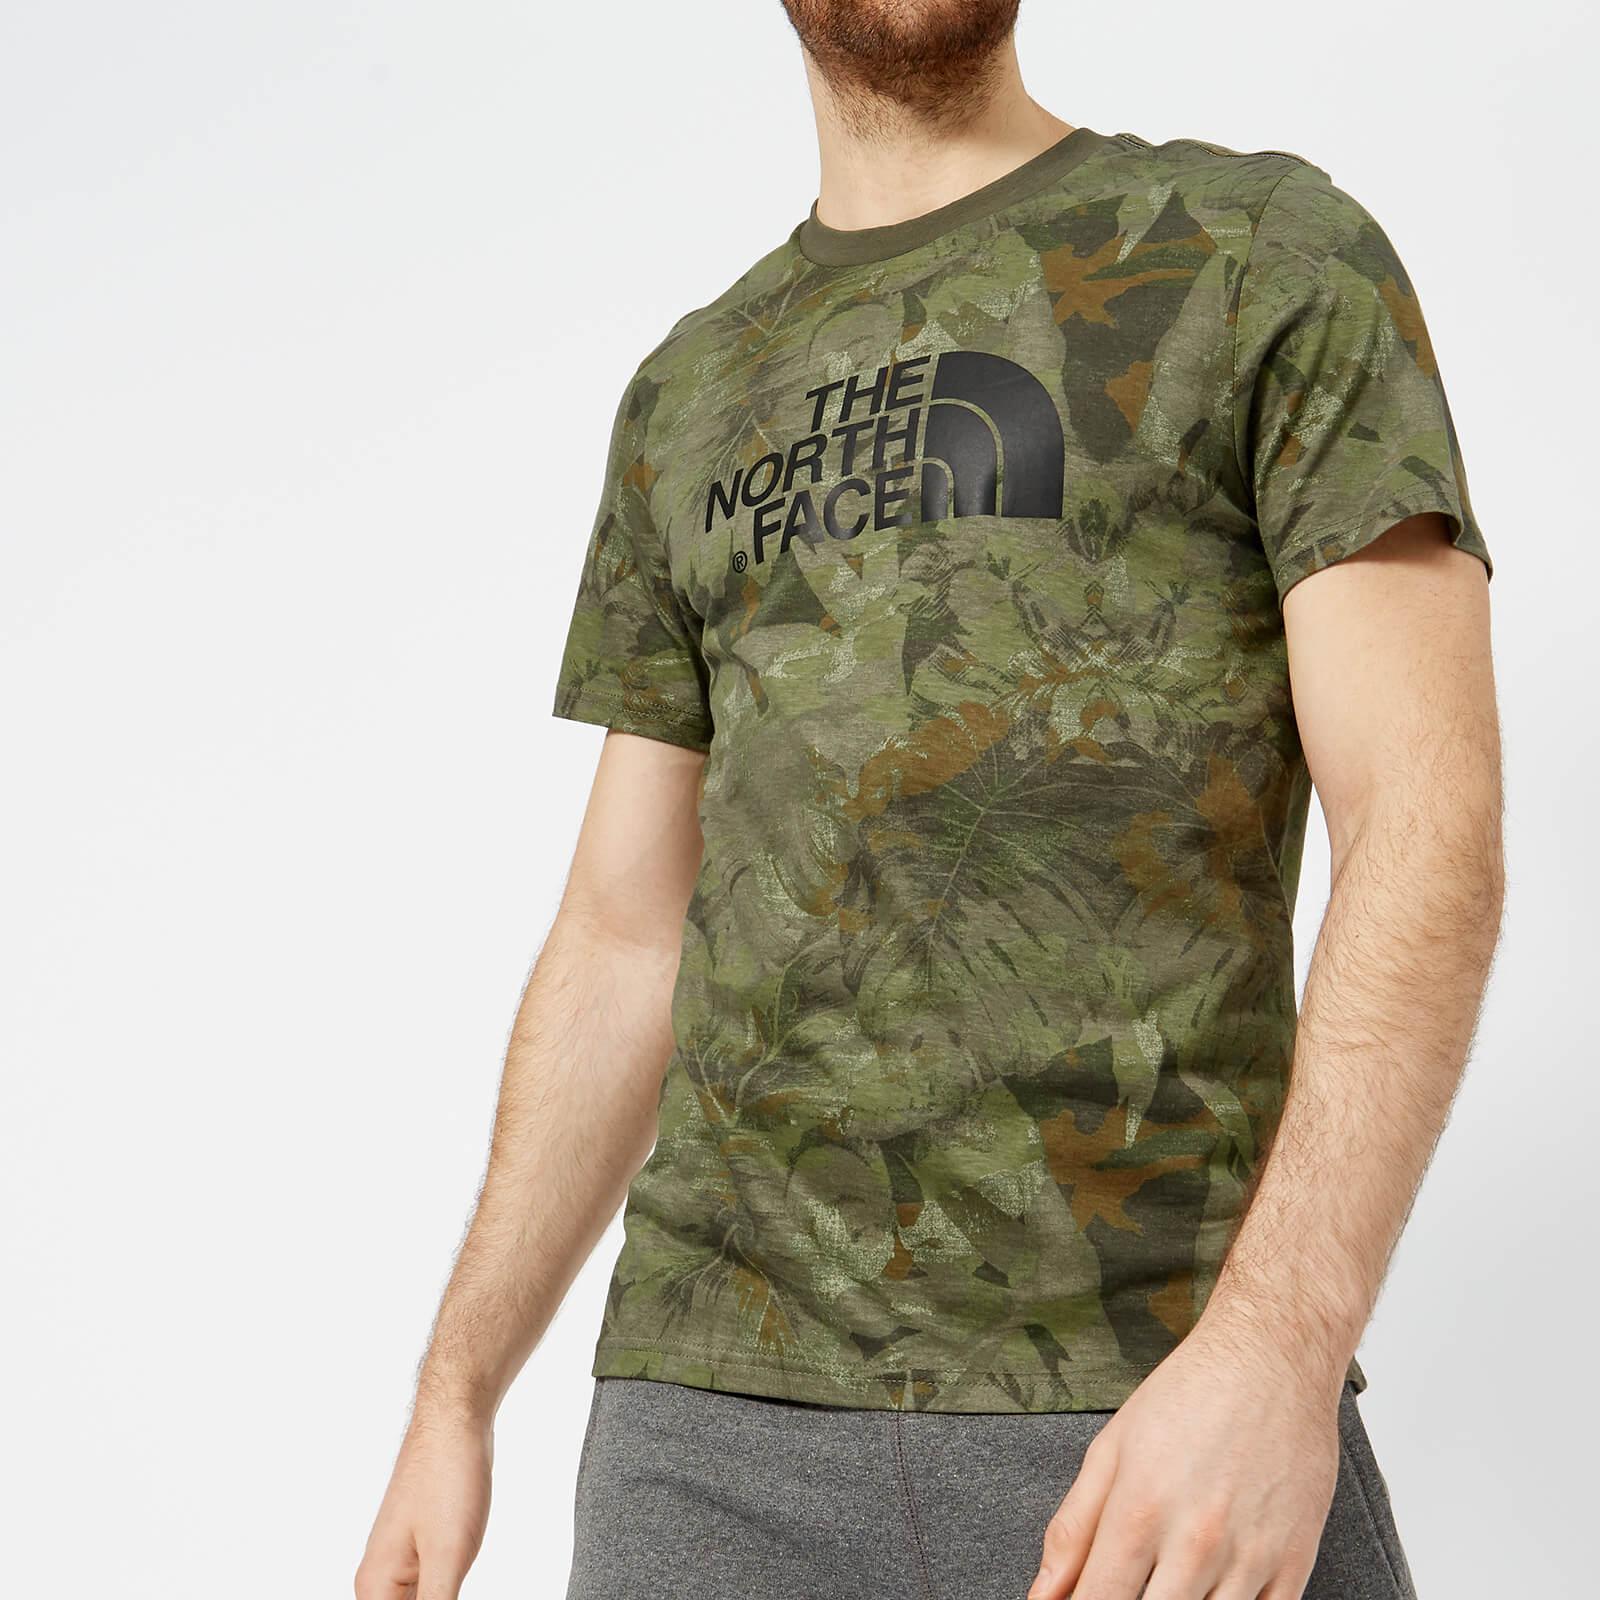 8c0beddd9 The North Face Men's Short Sleeve Easy T-Shirt - English Green Camo Print